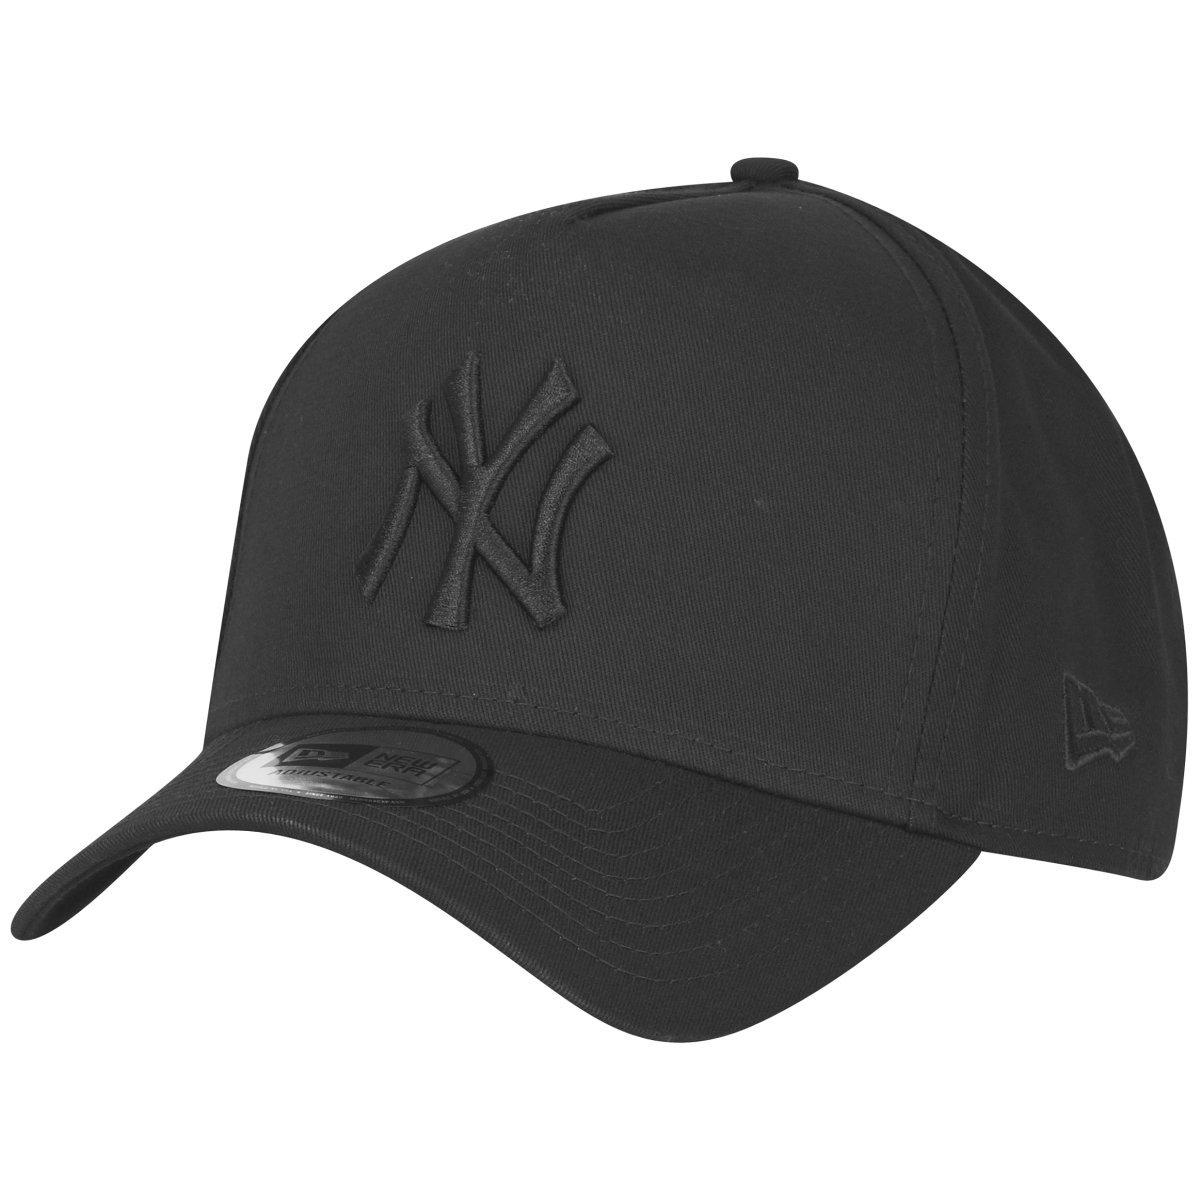 f80f5c88 New Era A-Frame Trucker Cap - New York Yankees black: Amazon.co.uk: Clothing